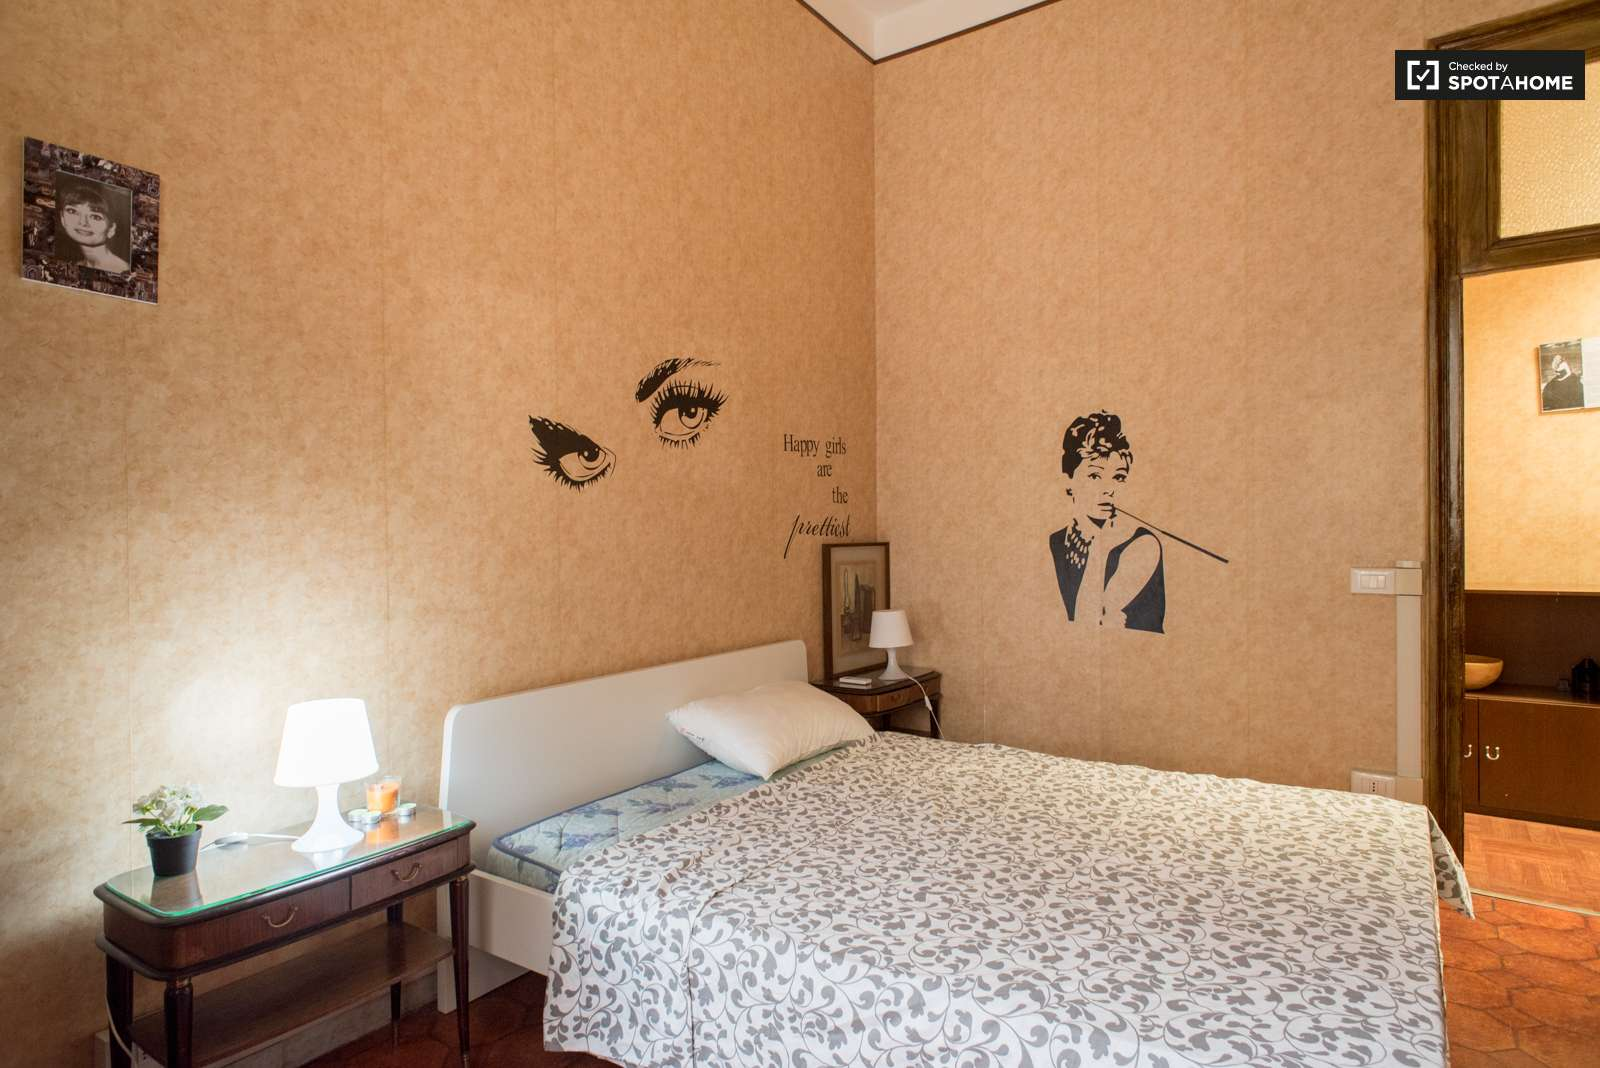 Orange Bedroom Wallpaper Rooms For Rent In 3 Bedroom Apartment In Rome City Center Spotahome